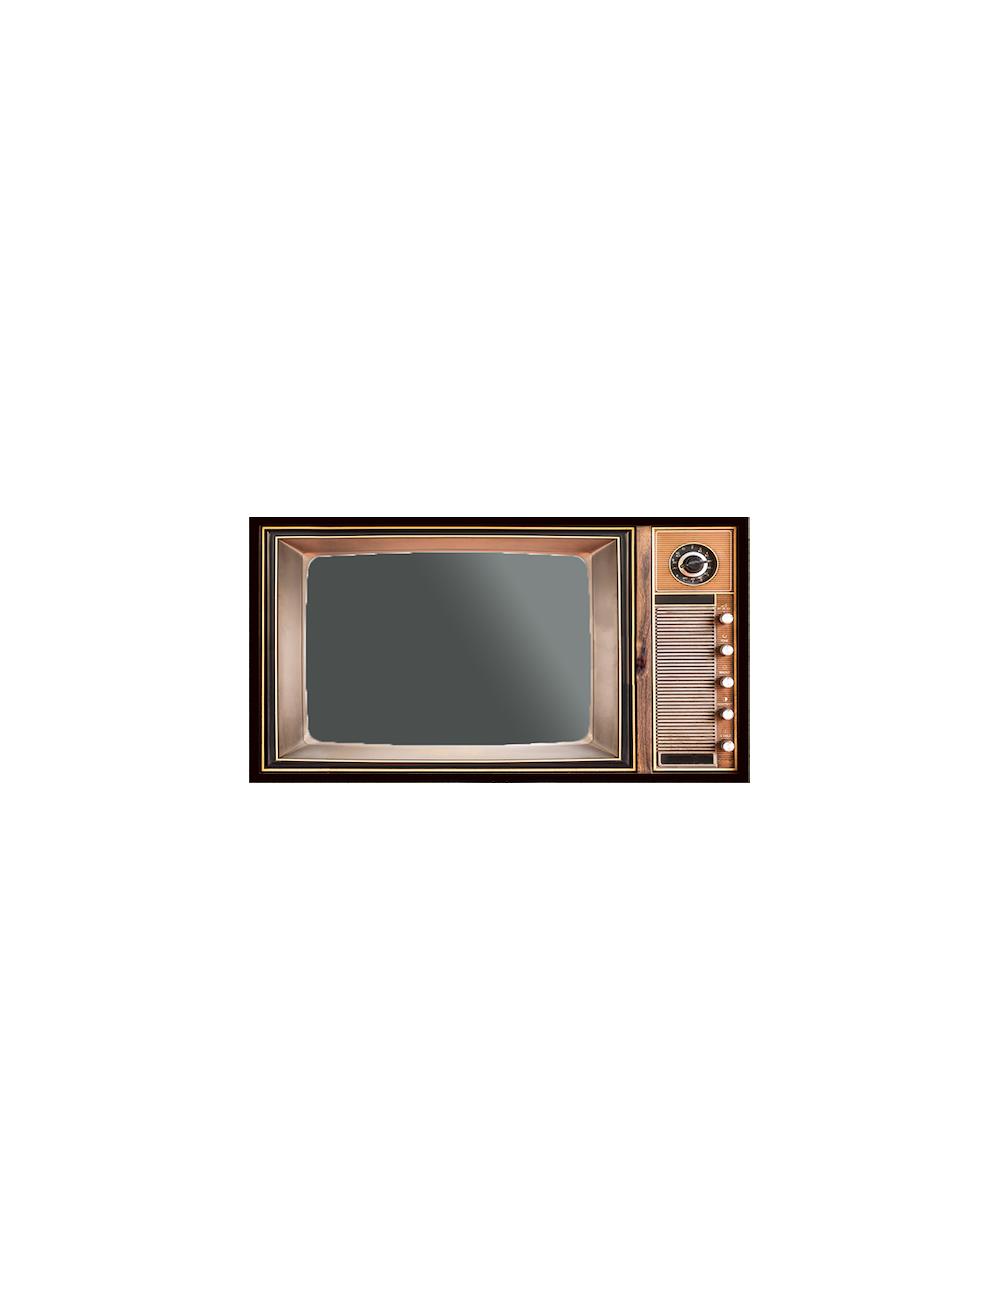 Nos Visuels - 329 1-TV VINTAGE